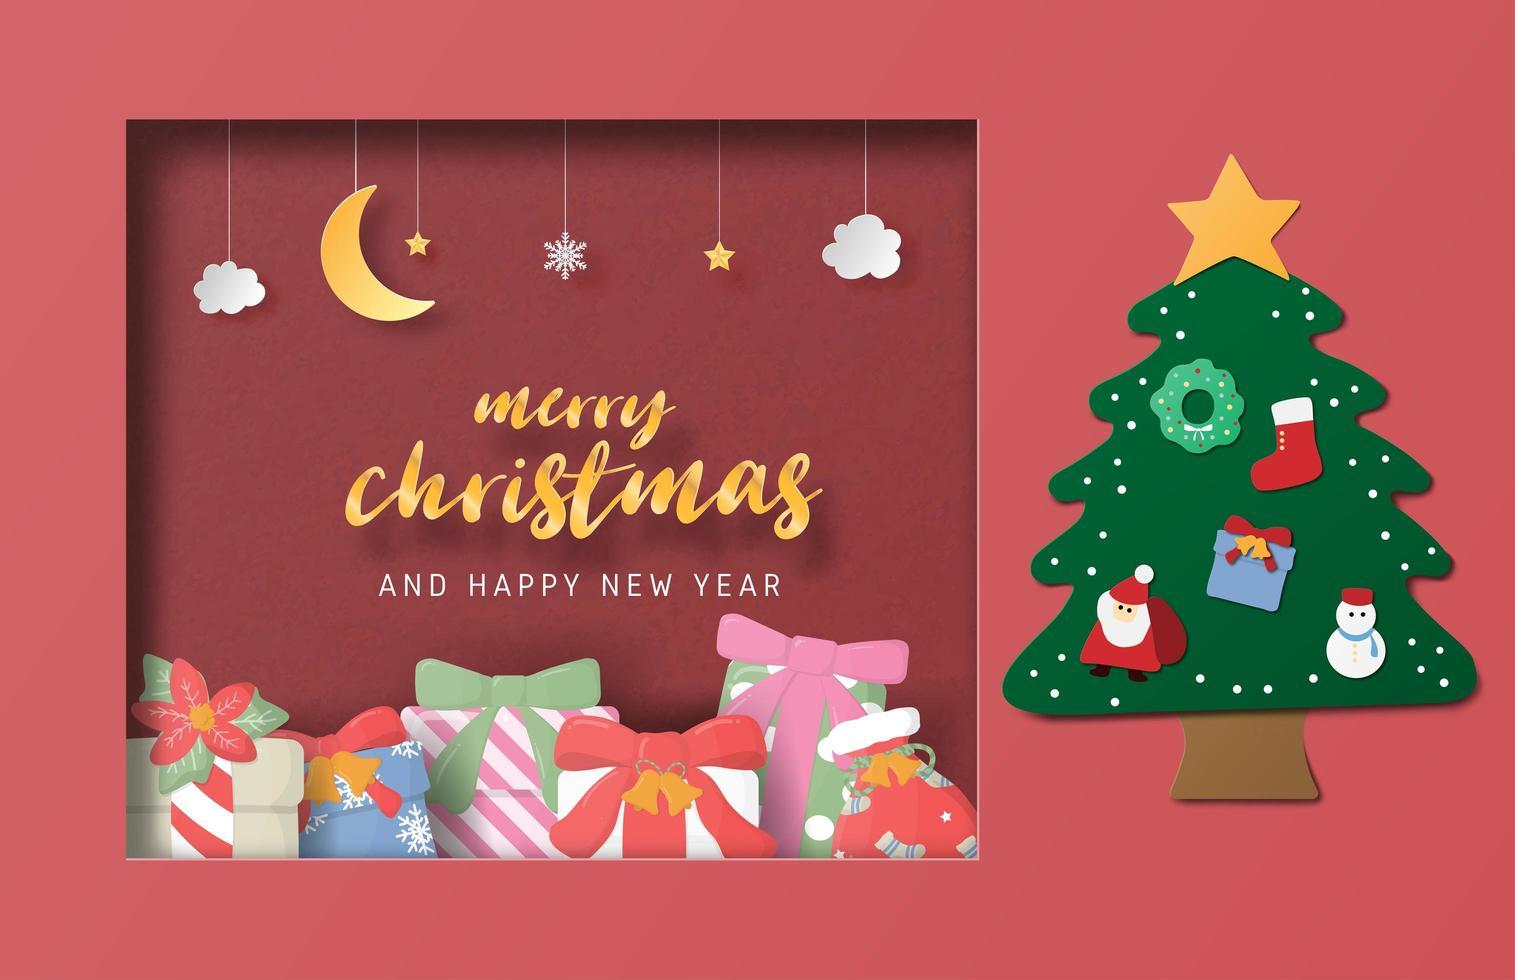 Cartolina d'auguri di celebrazione di Natale in stile taglio carta. vettore